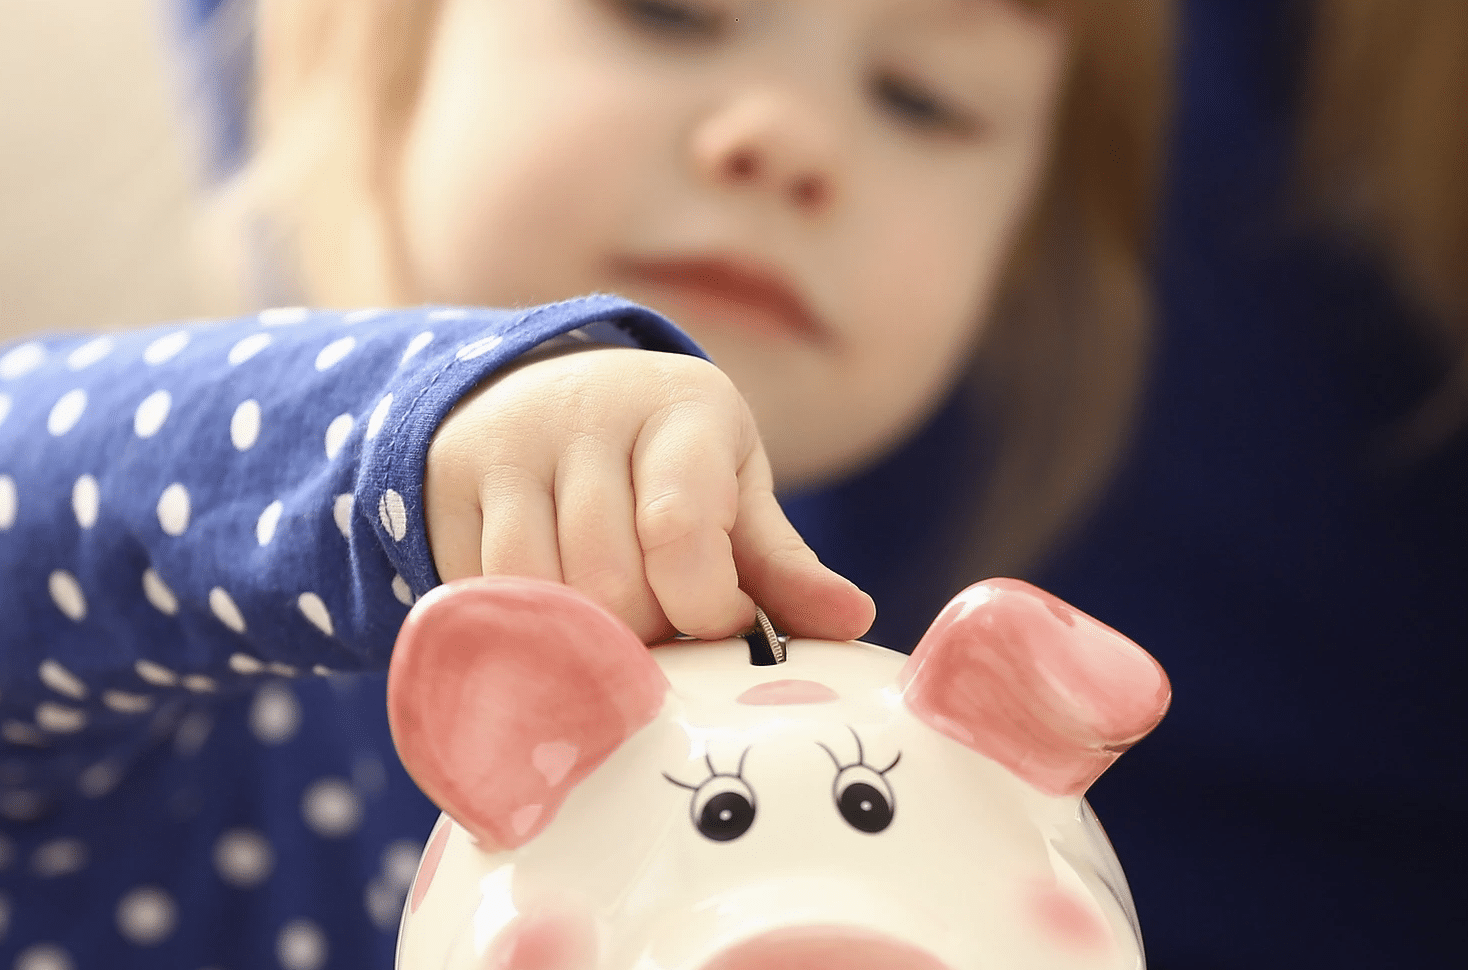 Baby putting money in piggy bank